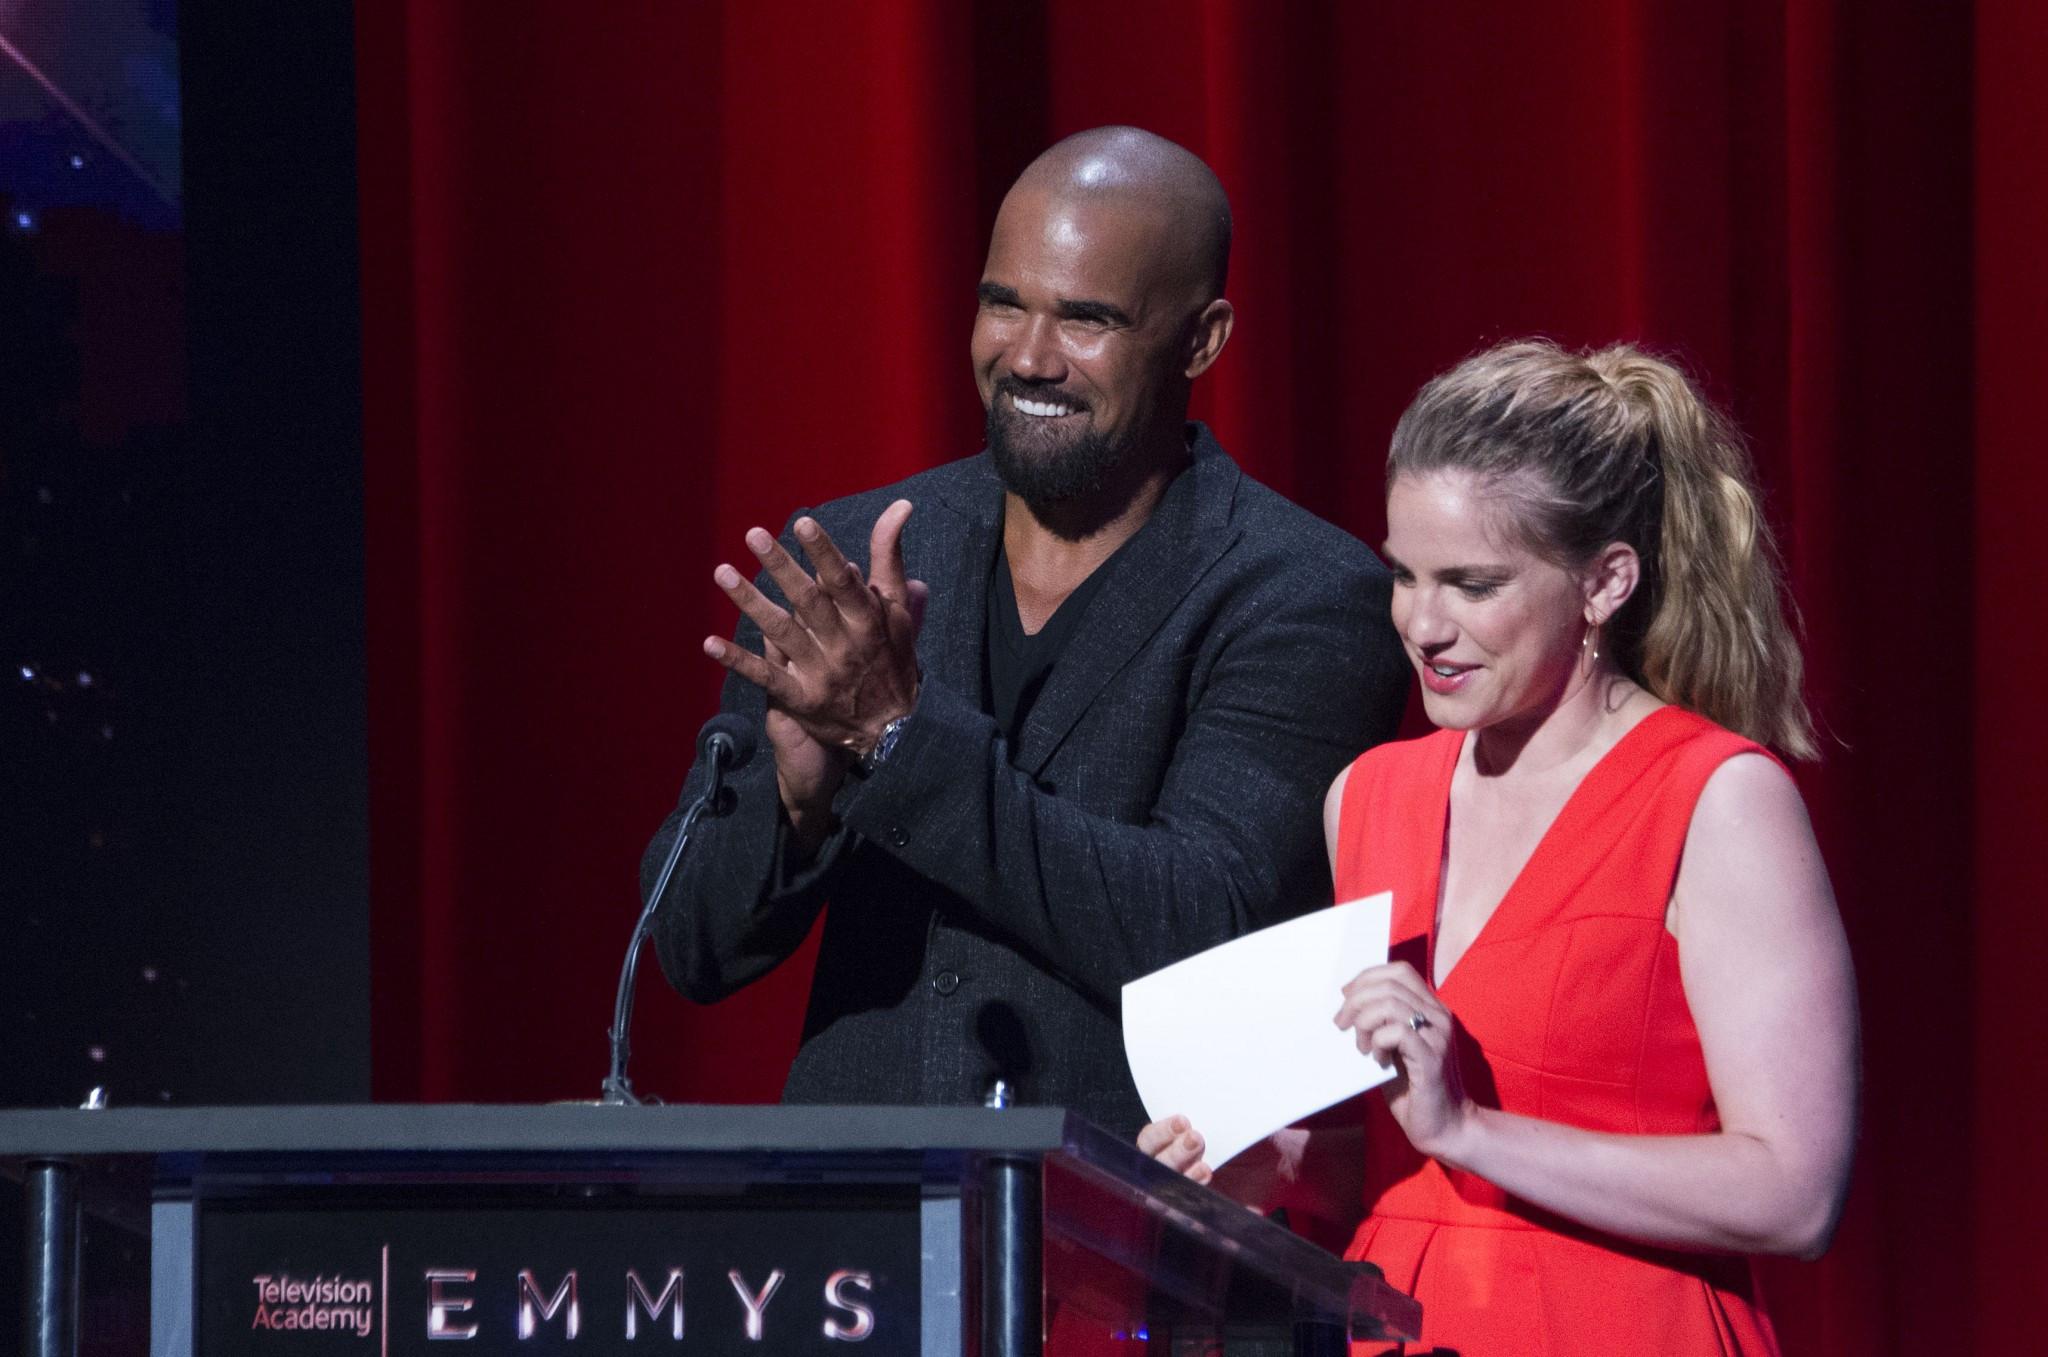 Bach to accompany Los Angeles Mayor to Emmy Awards ceremony